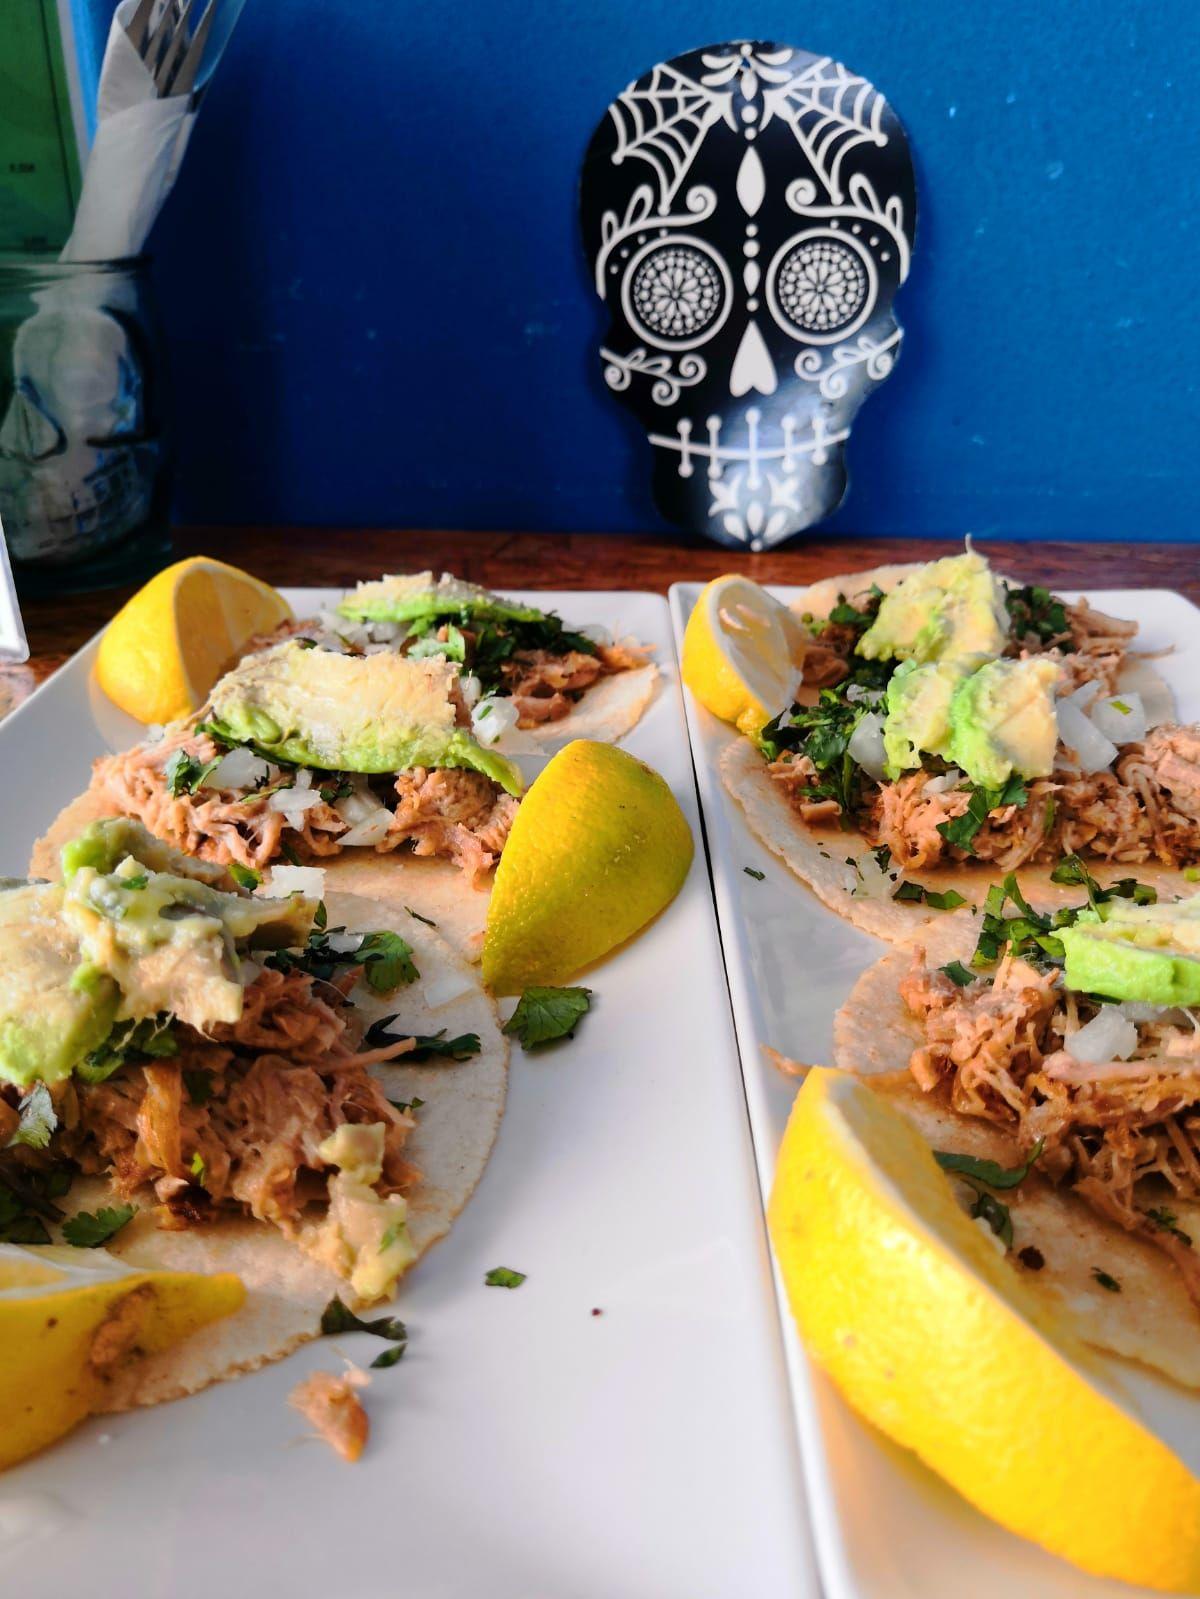 Foto 43 de Restaurante mexicano en  | Cantina La Catrina